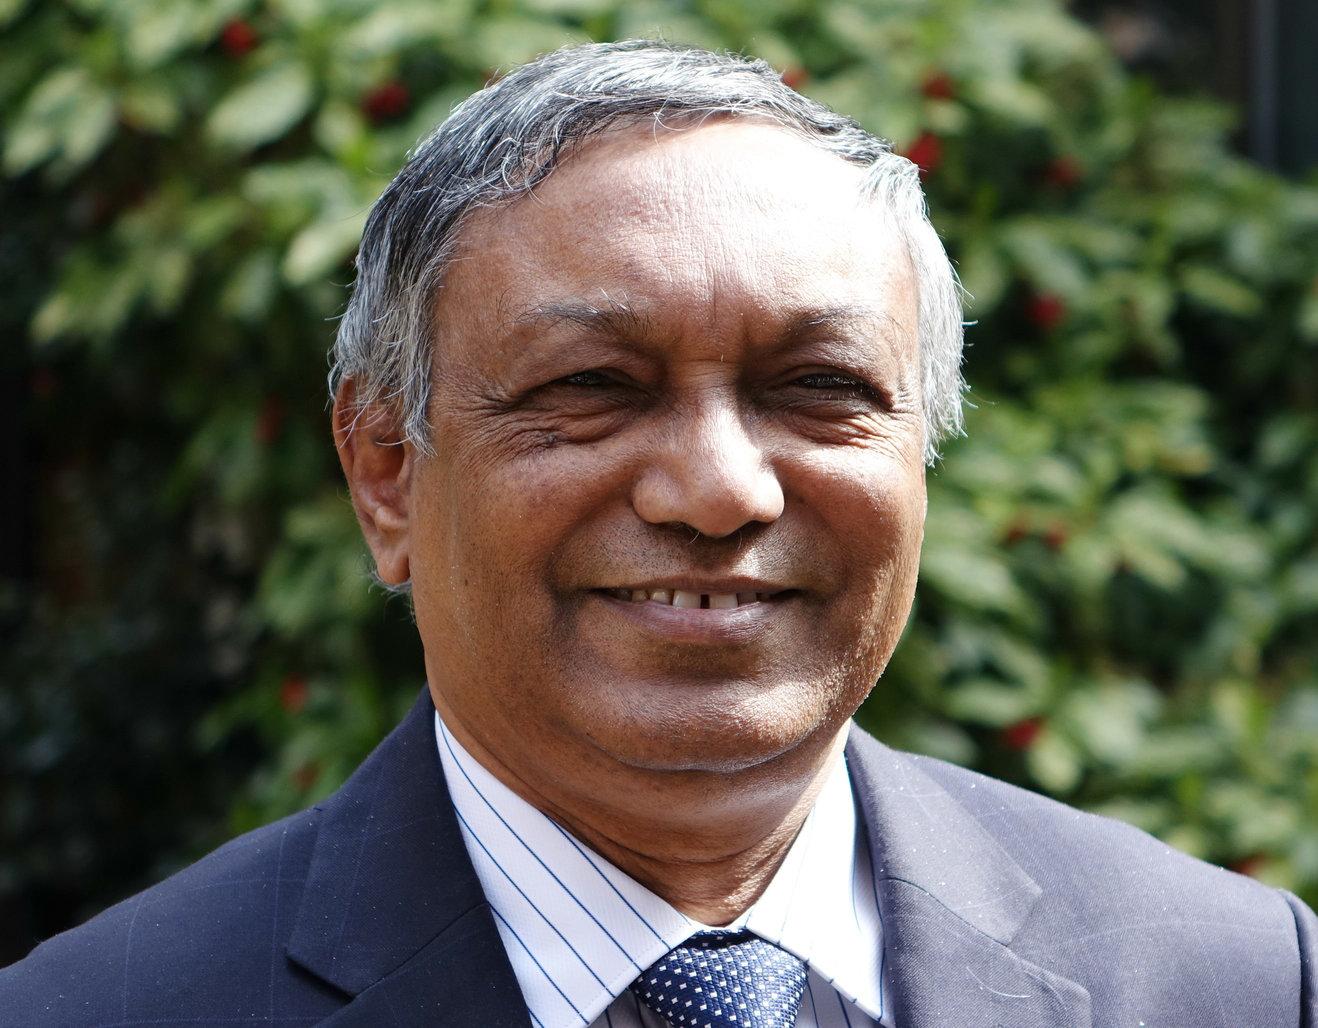 Portrait of Dr. Swapan Kumar Roy